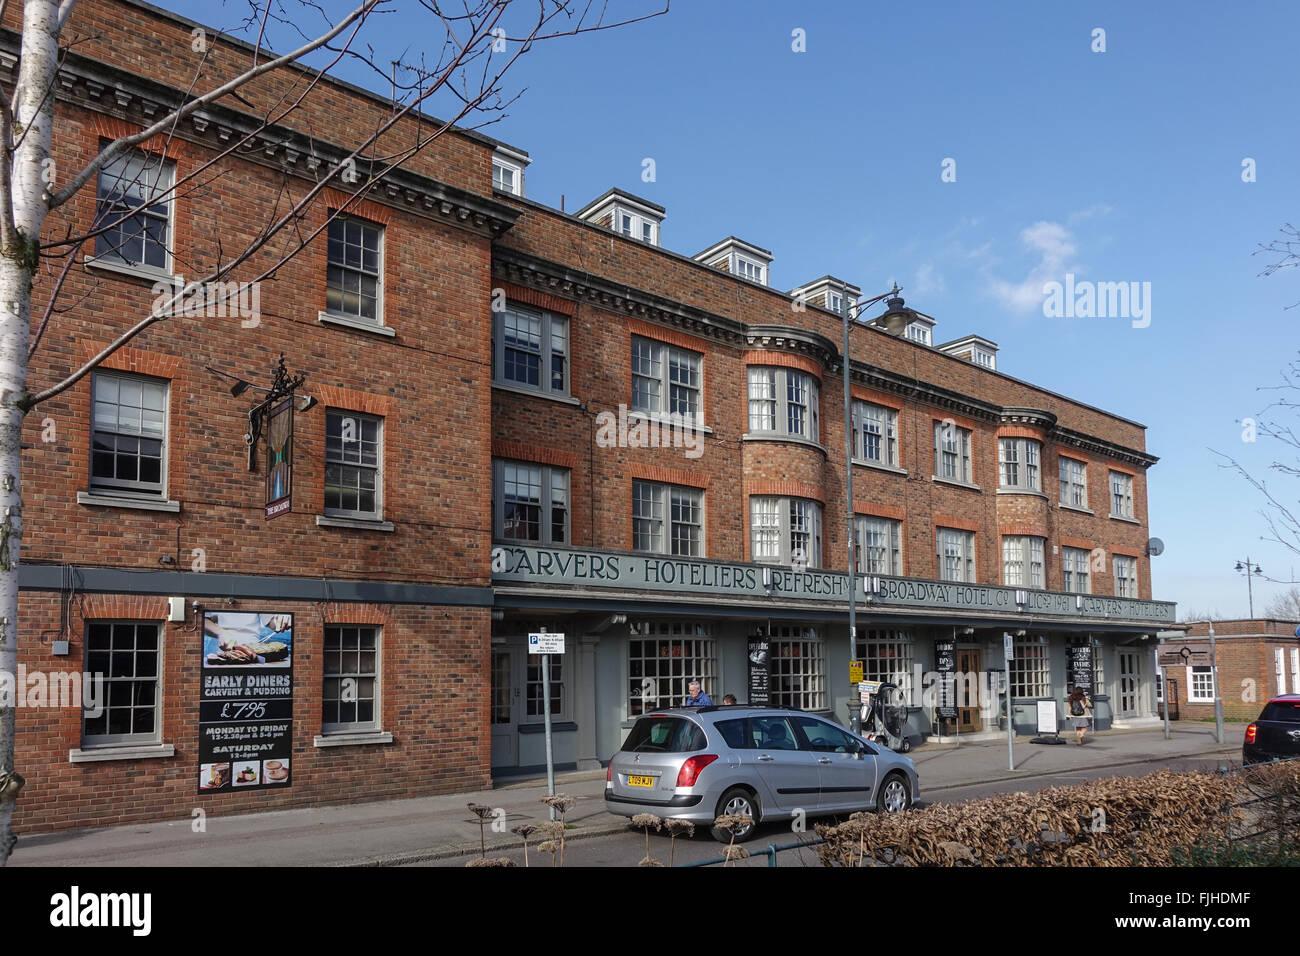 Car Parking Welwyn Garden City